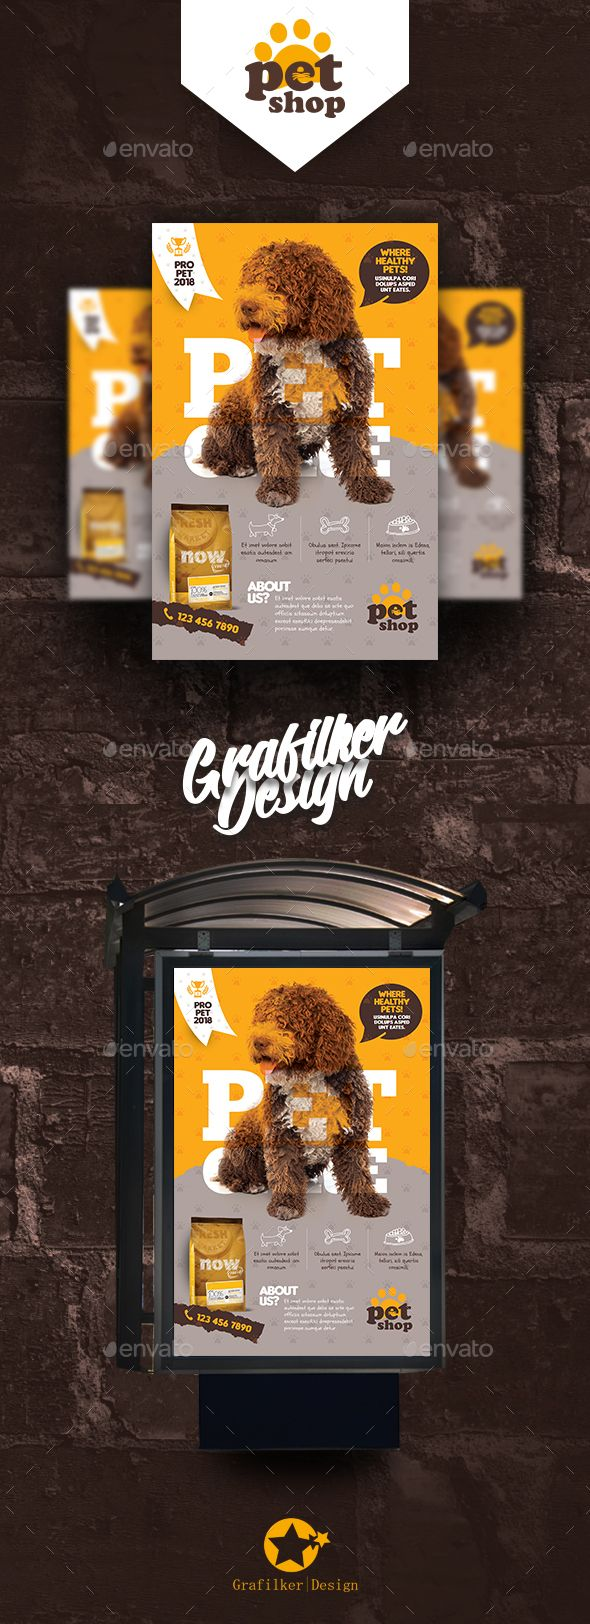 #Pet Shop Poster Templates - #Signage Print Templates